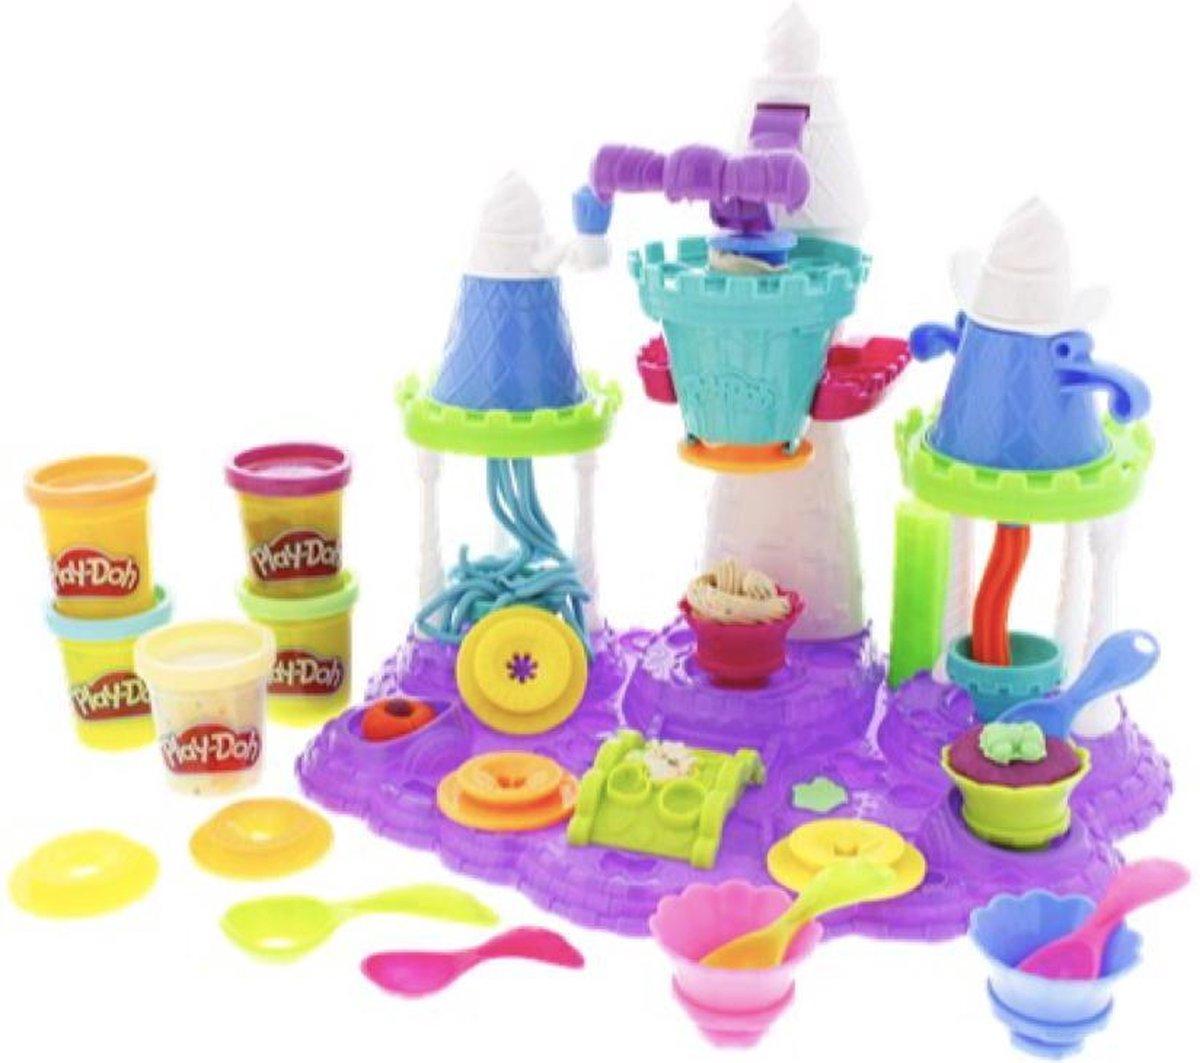 Play-Doh - ijskasteel - Speelgoed kasteel - Klei - Speelgoed klei - Play-doh ijskasteel - ijs - XL speelgoedset - ijsjes fabriek